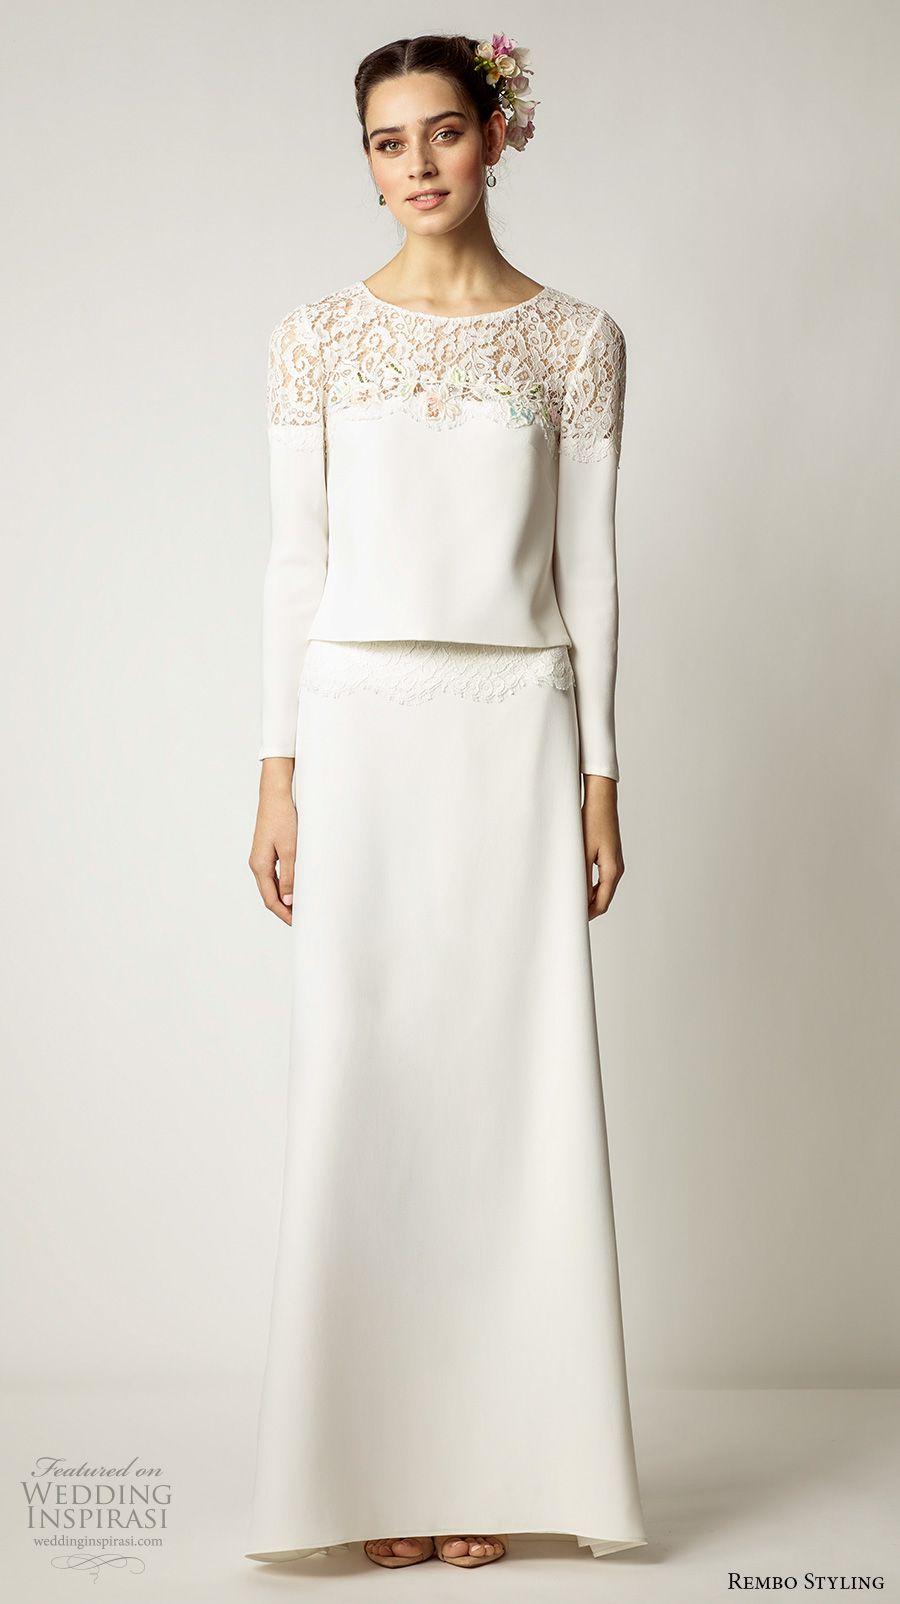 Rembo styling wedding dresses embellished top wedding dress